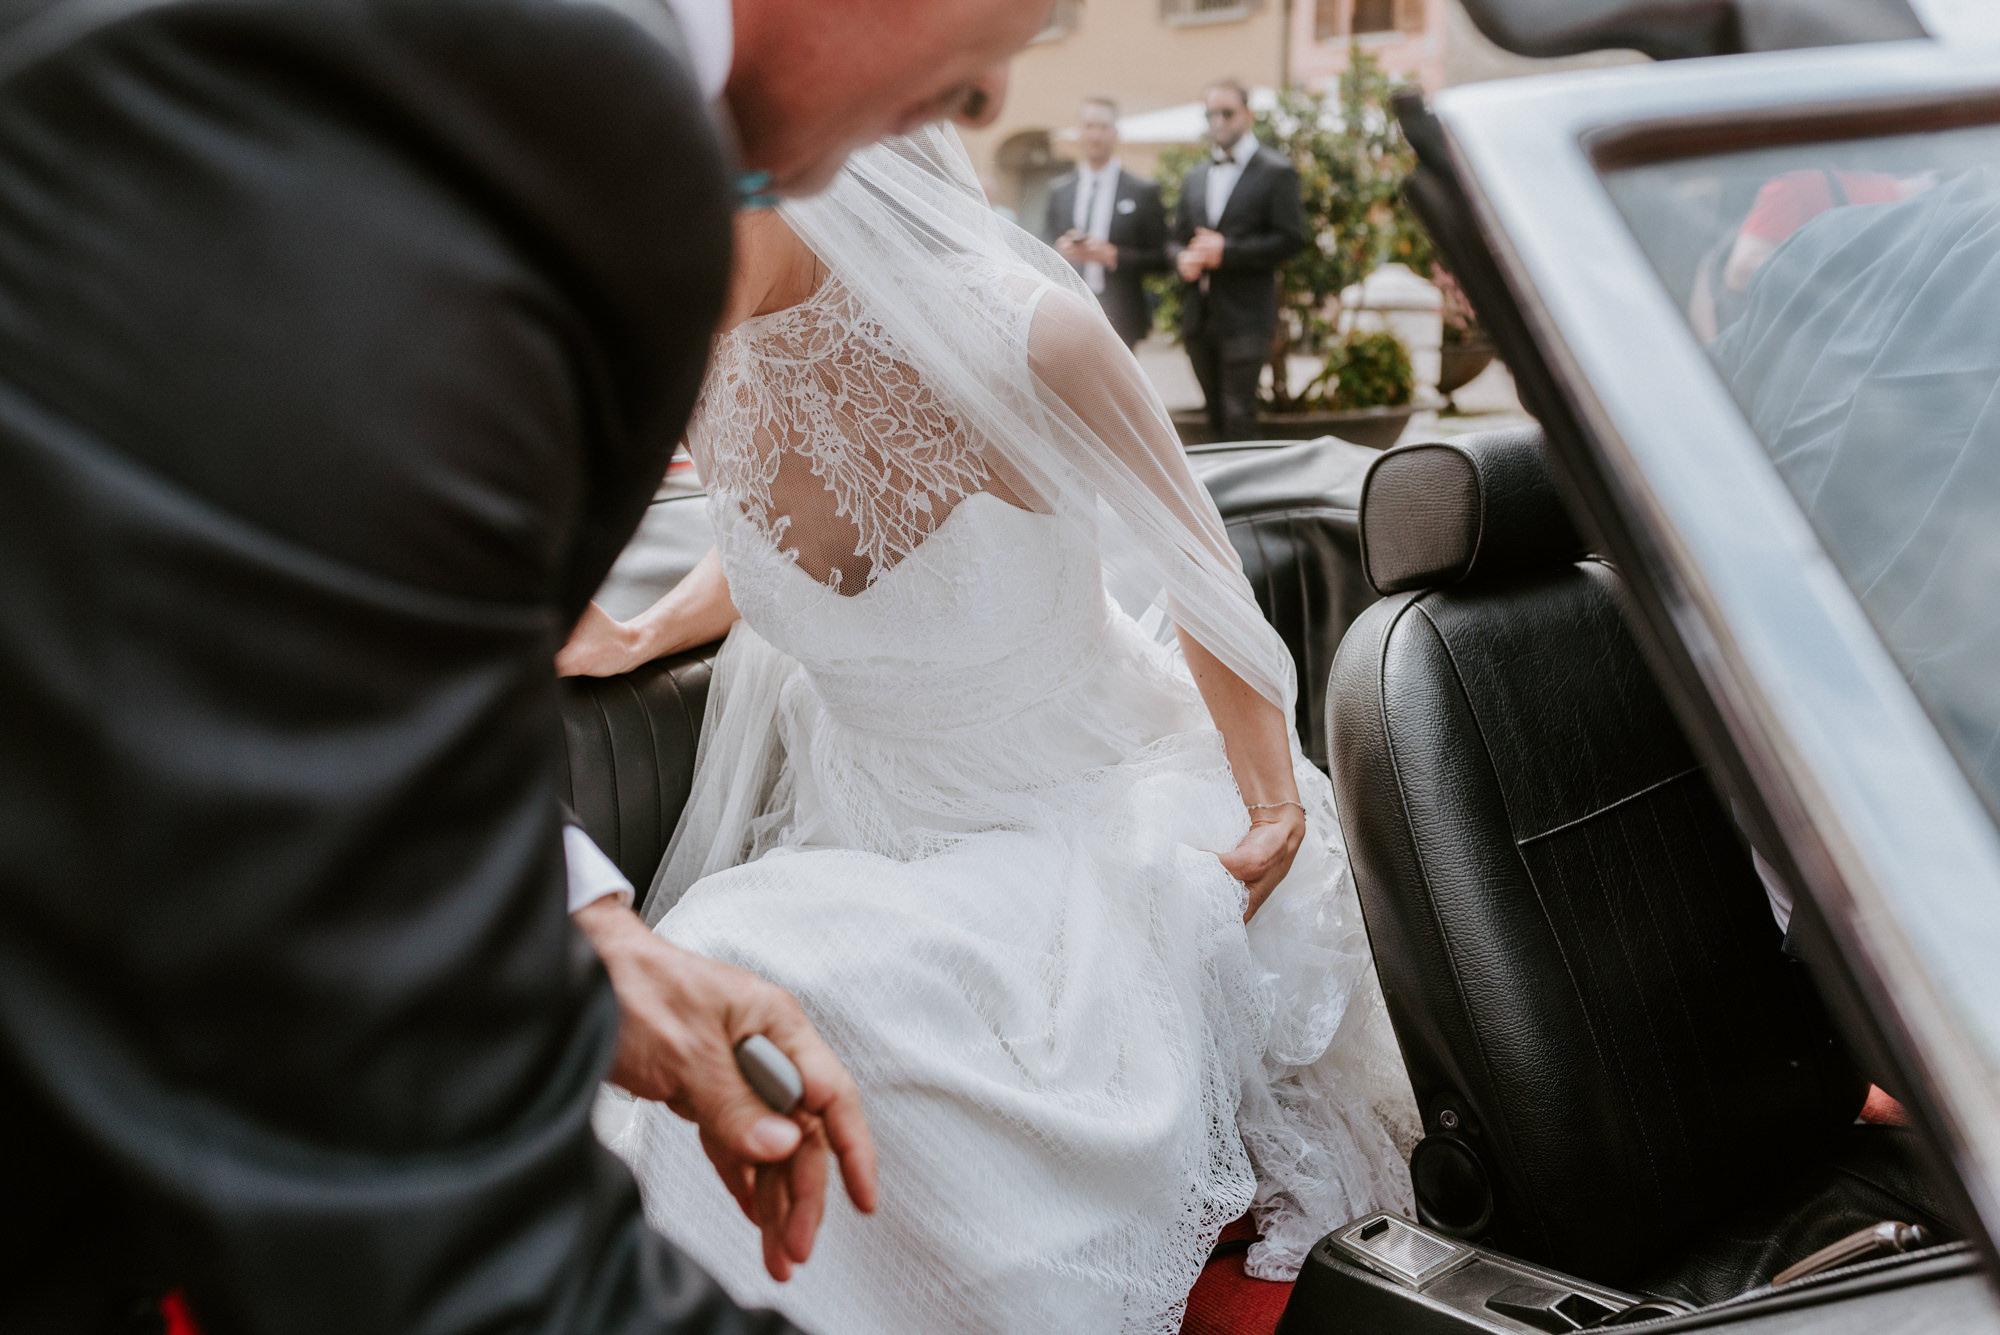 FOTO+PHOTO+BODA+WEDDING+ITALIA+ITALY+MAURICIO+GARAY+MAURICIOGARAY+WEDDINPHOTOGRAPHER+FOTOGRAFODEBODA-681.jpg